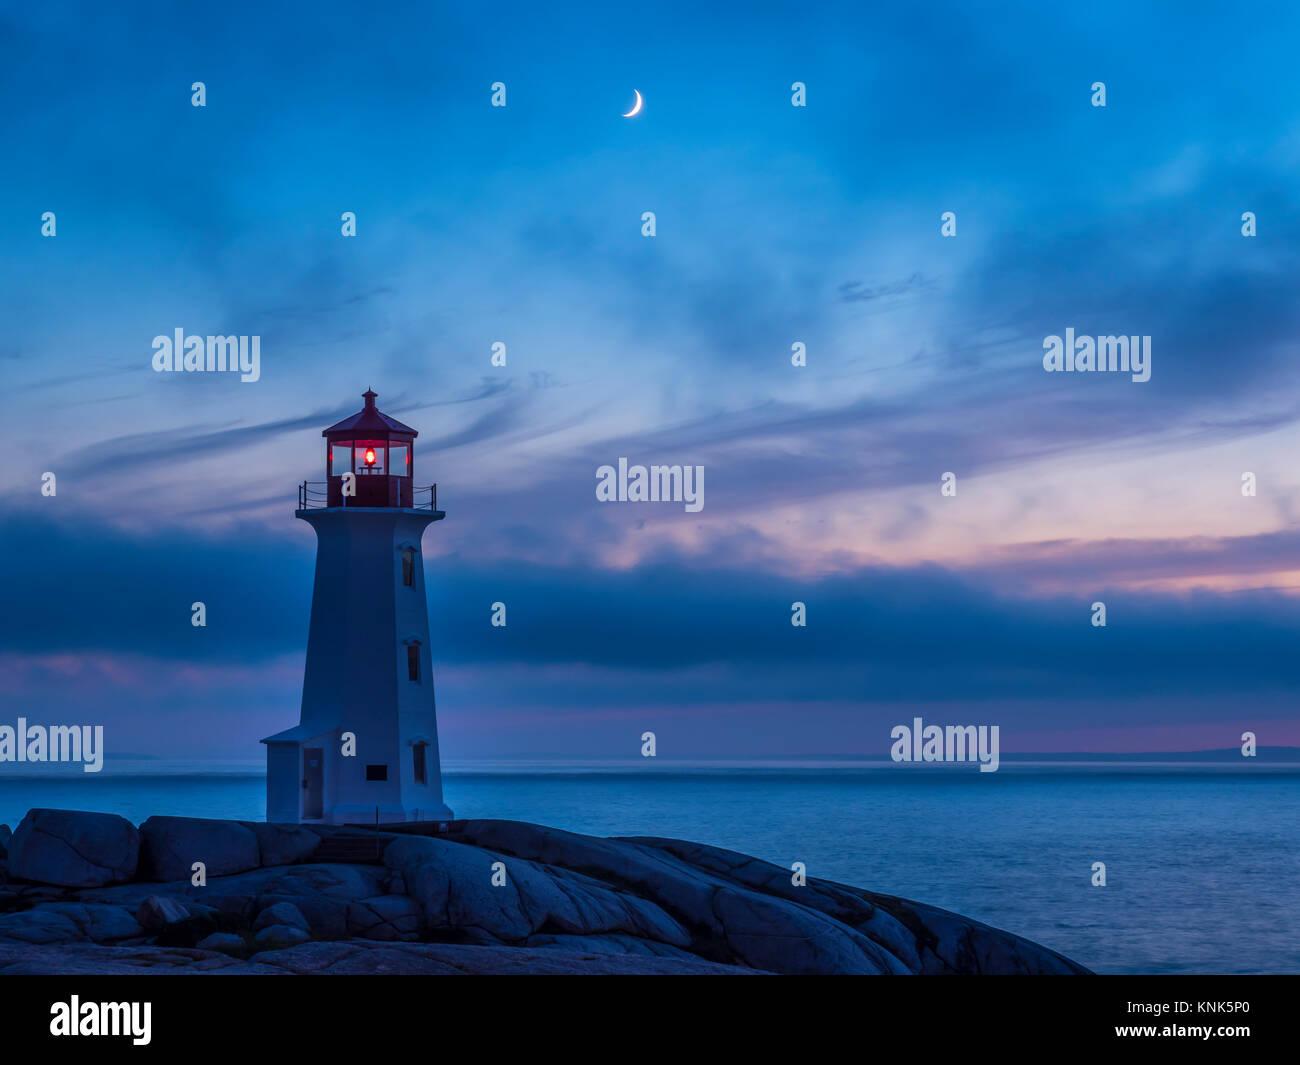 Crescent moon above Peggy's Cove Lighthouse, Peggy's Cove, Nova Scotia, Canada. - Stock Image